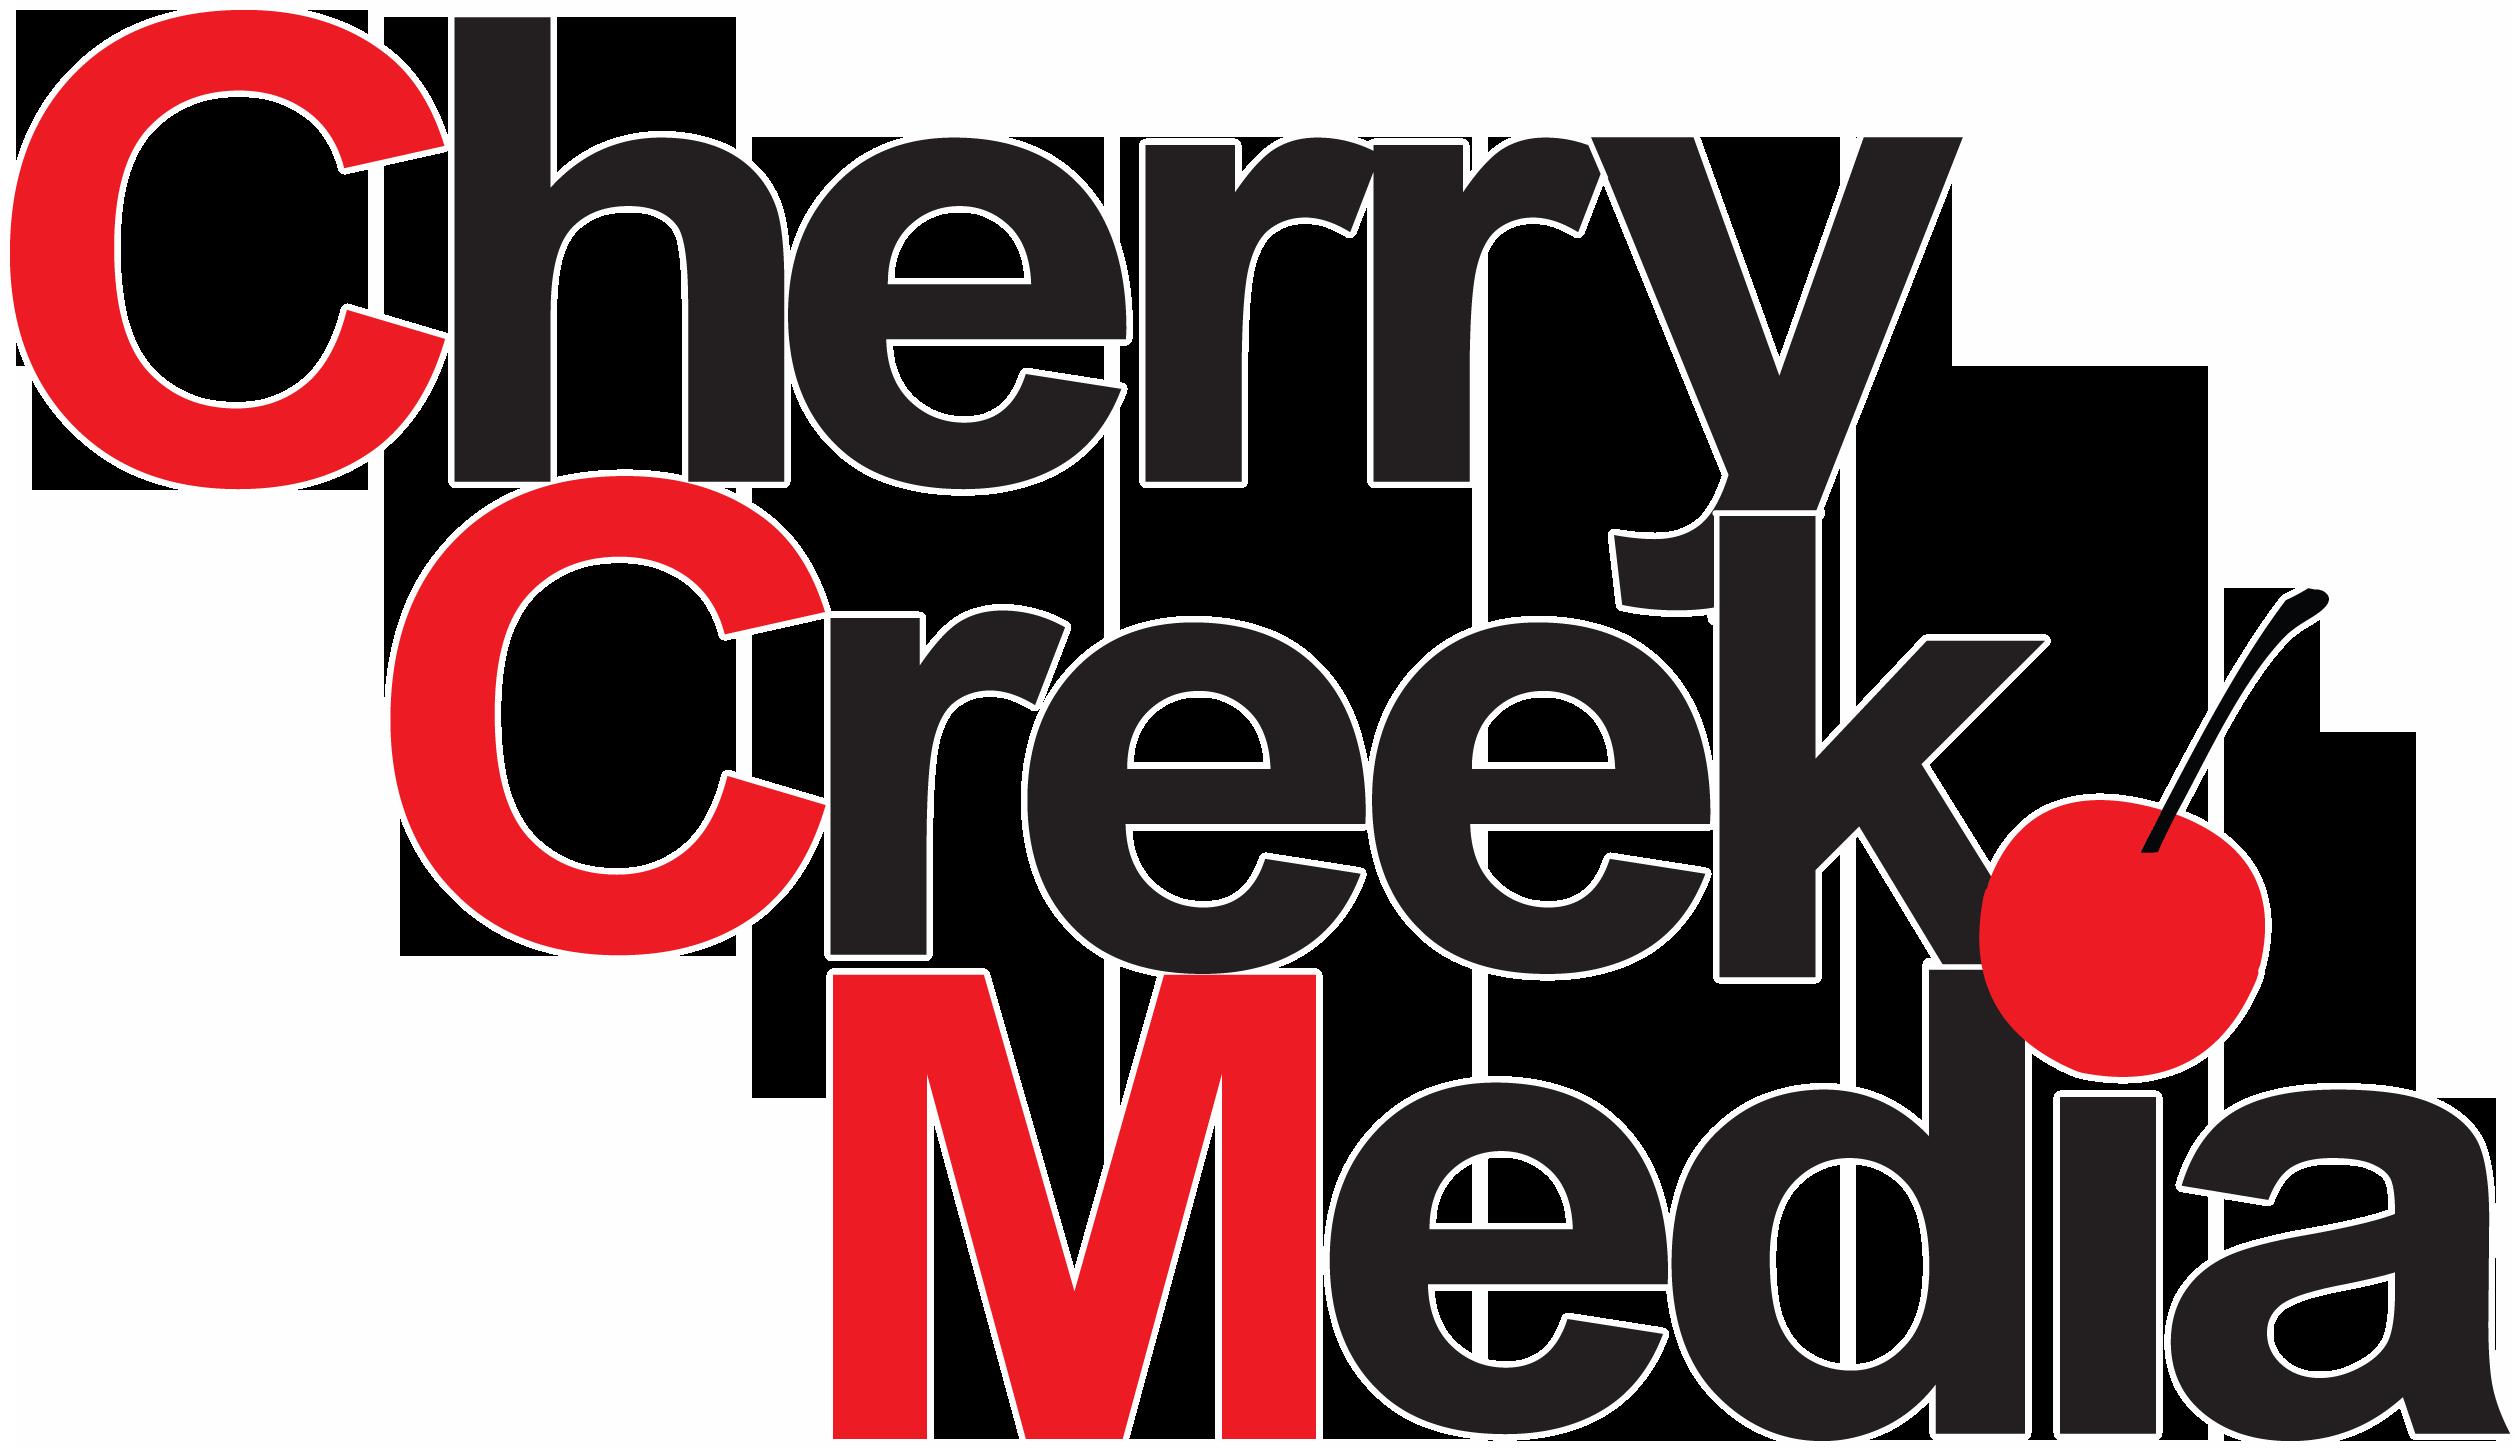 ccr-media